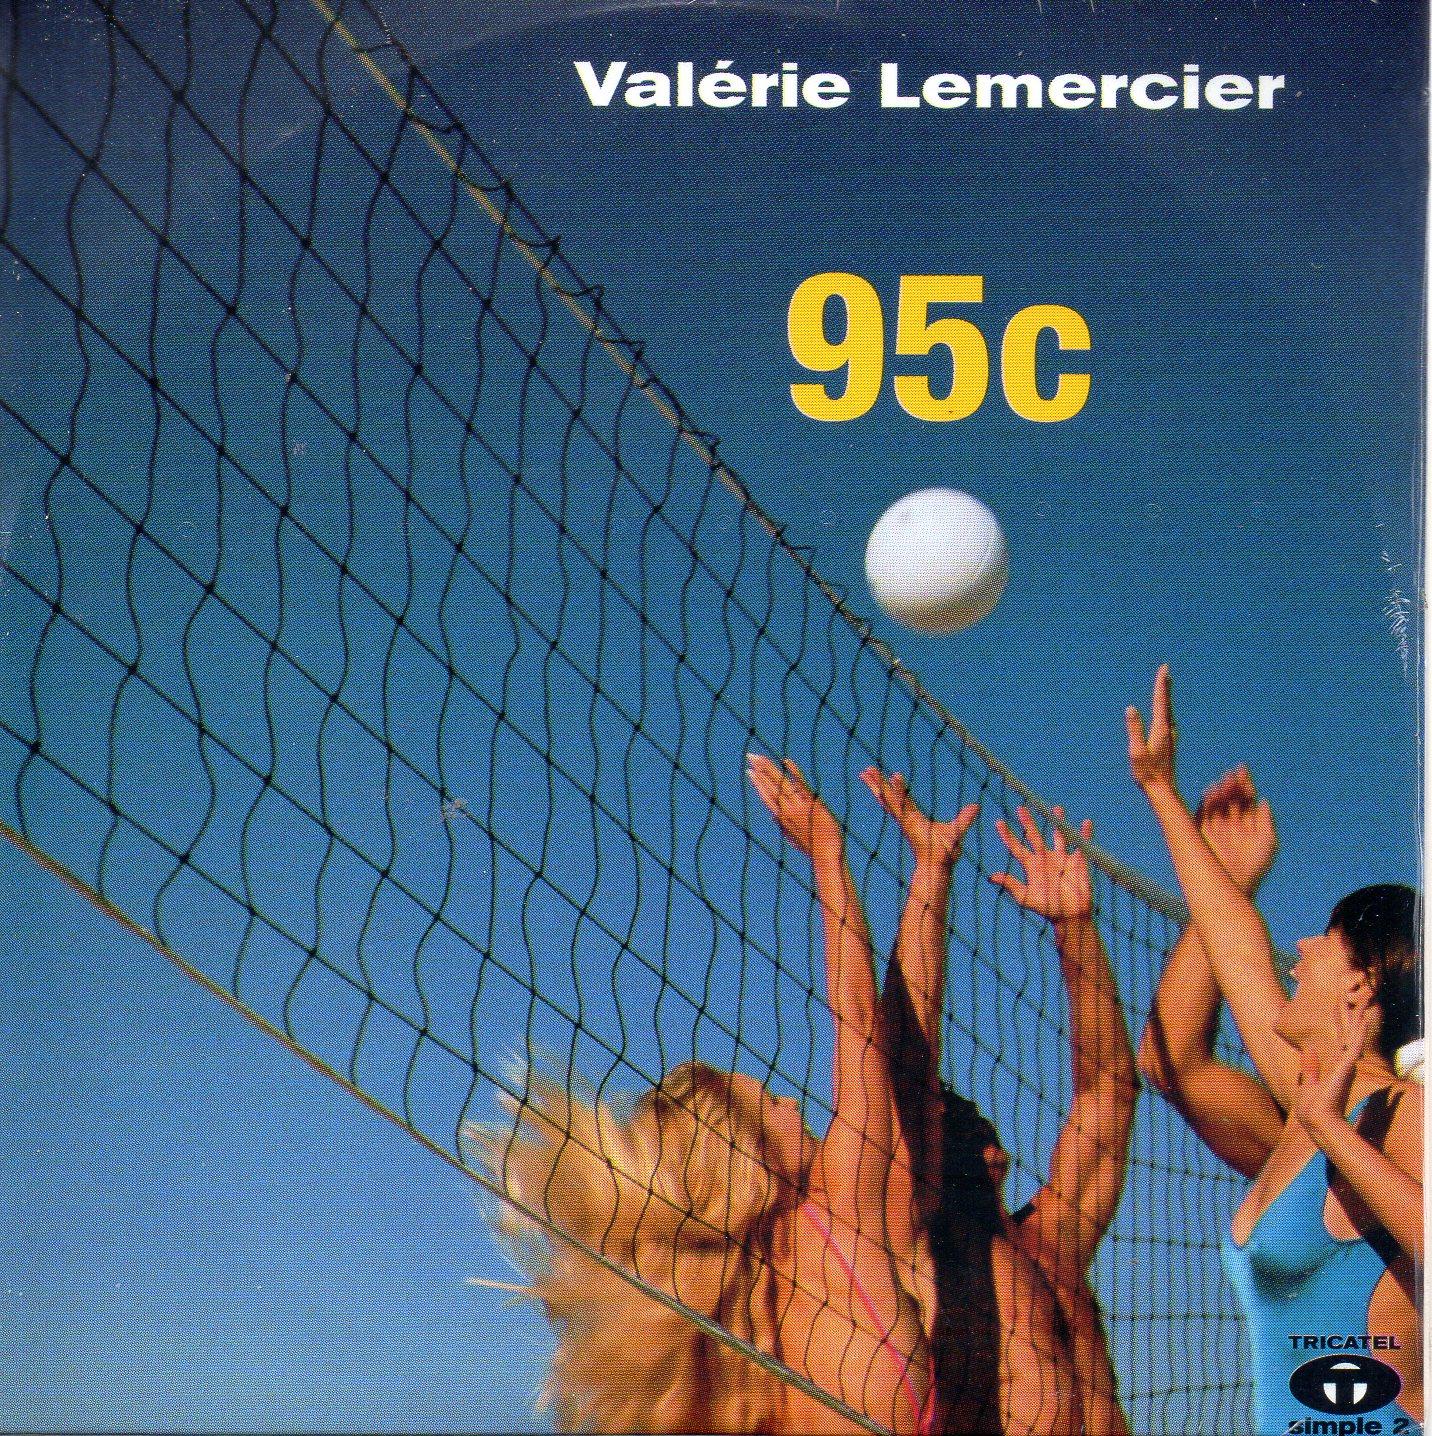 VALÉRIE LEMERCIER - BERTRAND BURGALAT - 95c 2-Track CARD SLEEVE - CD single